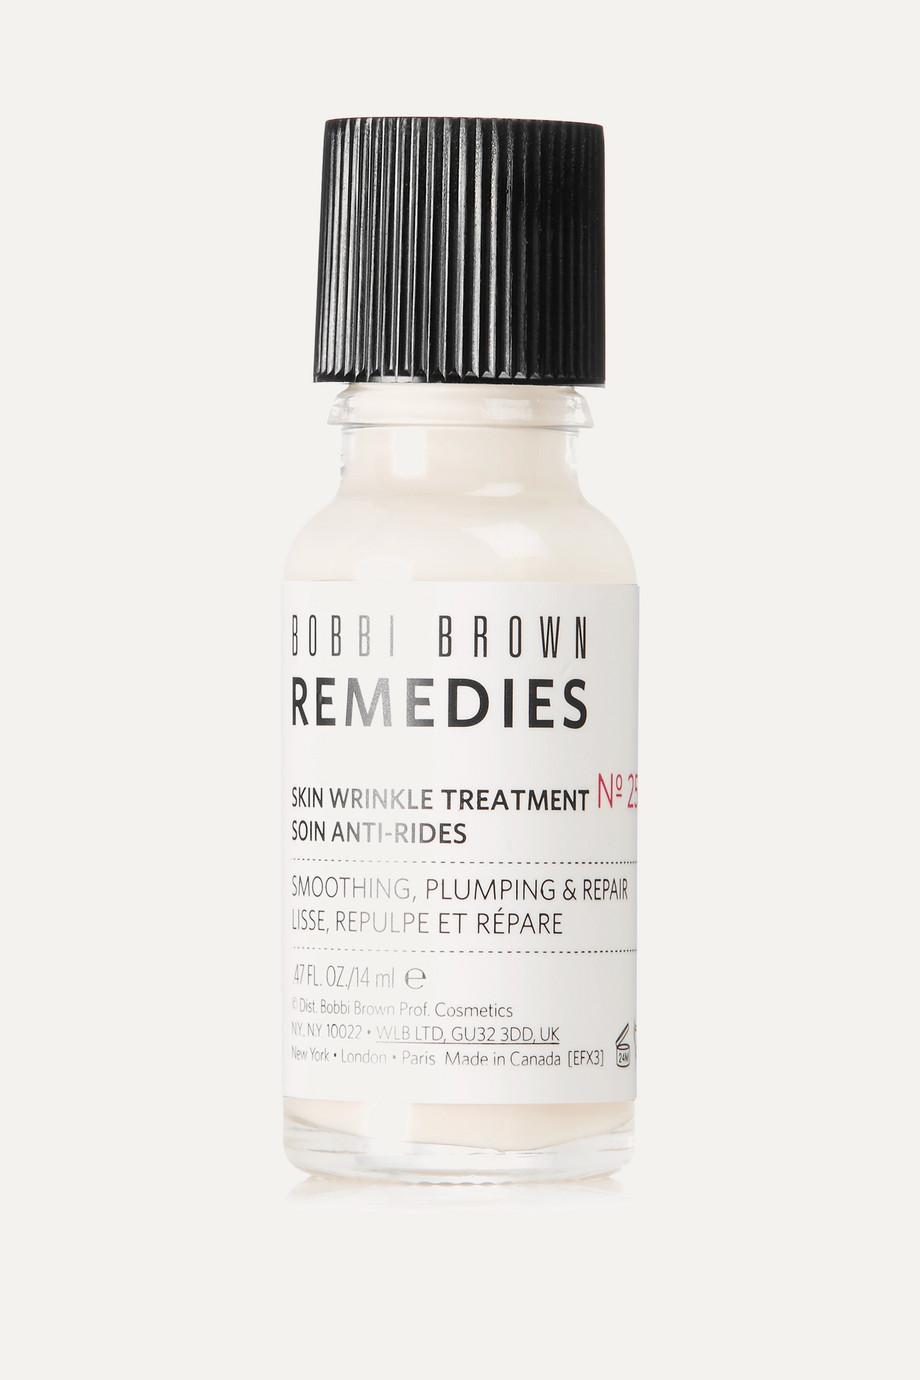 Bobbi Brown No.25 Skin Wrinkle Treatment, 14 ml – Serum